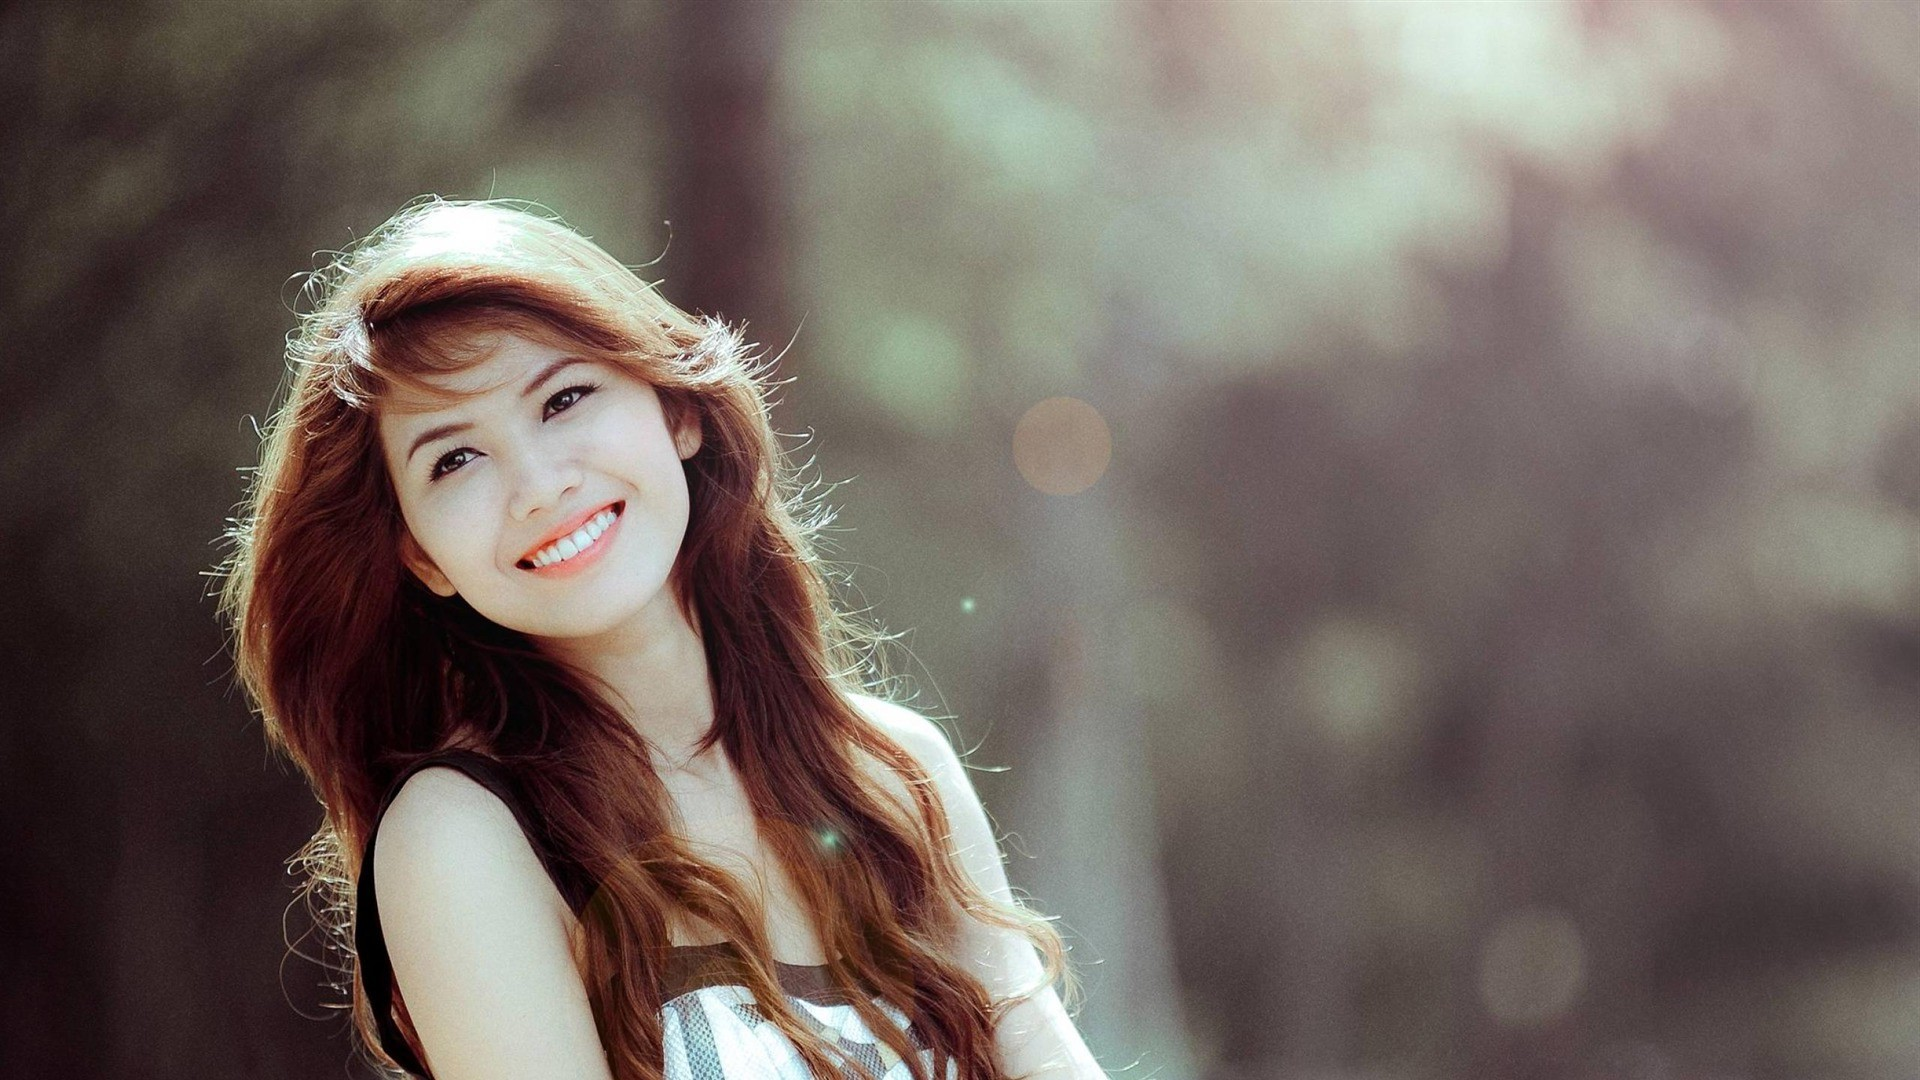 Most Beautiful Women HD Wallpaper – WallpaperSafari